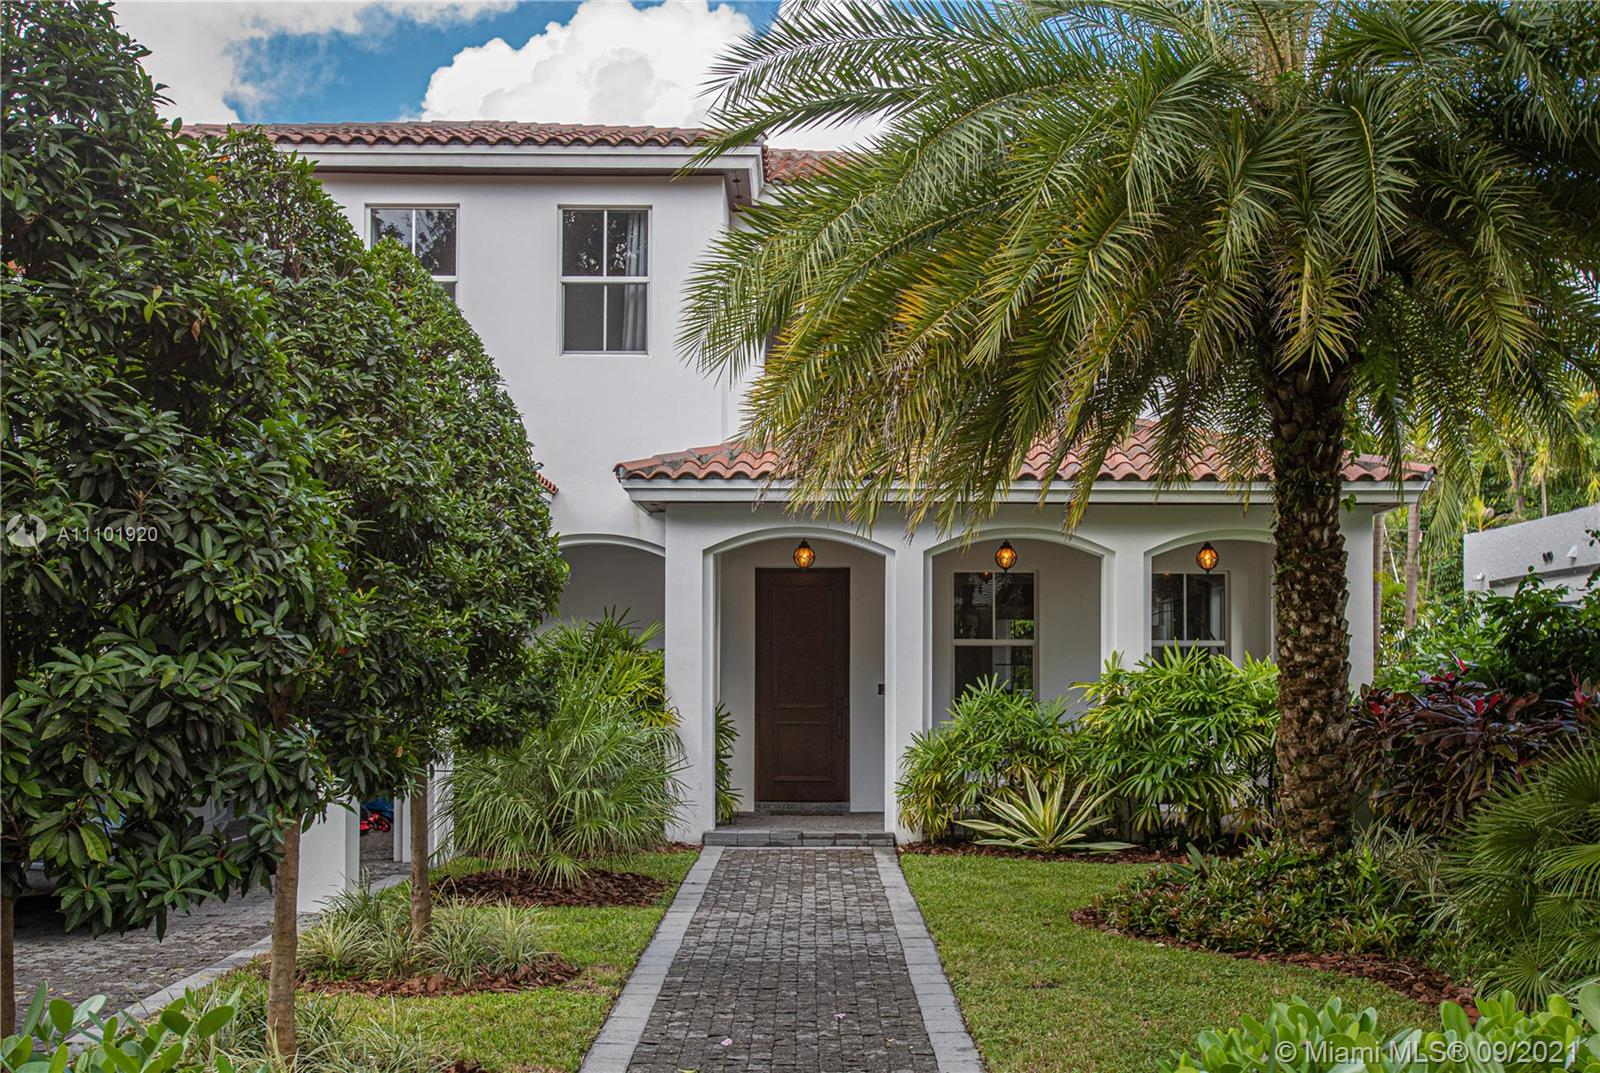 Single Family Home,For Sale,1401 Sorolla Ave, Coral Gables, Florida 33134,Brickell,realty,broker,condos near me